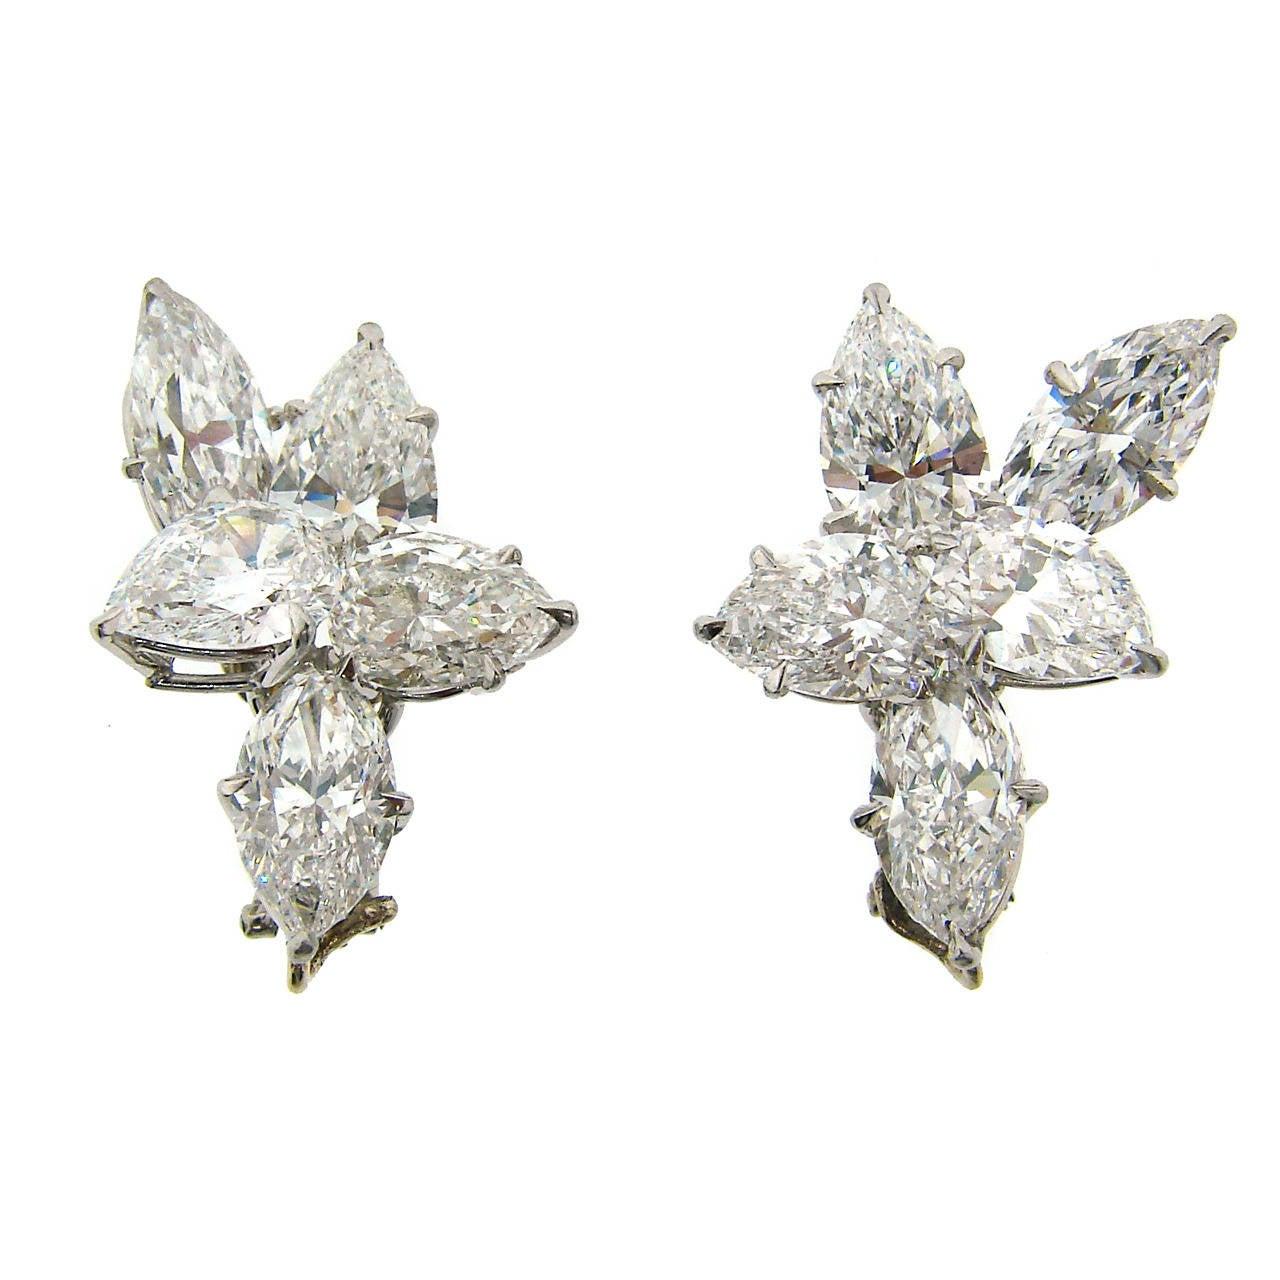 Harry Winston Diamond Platinum Cluster Earrings